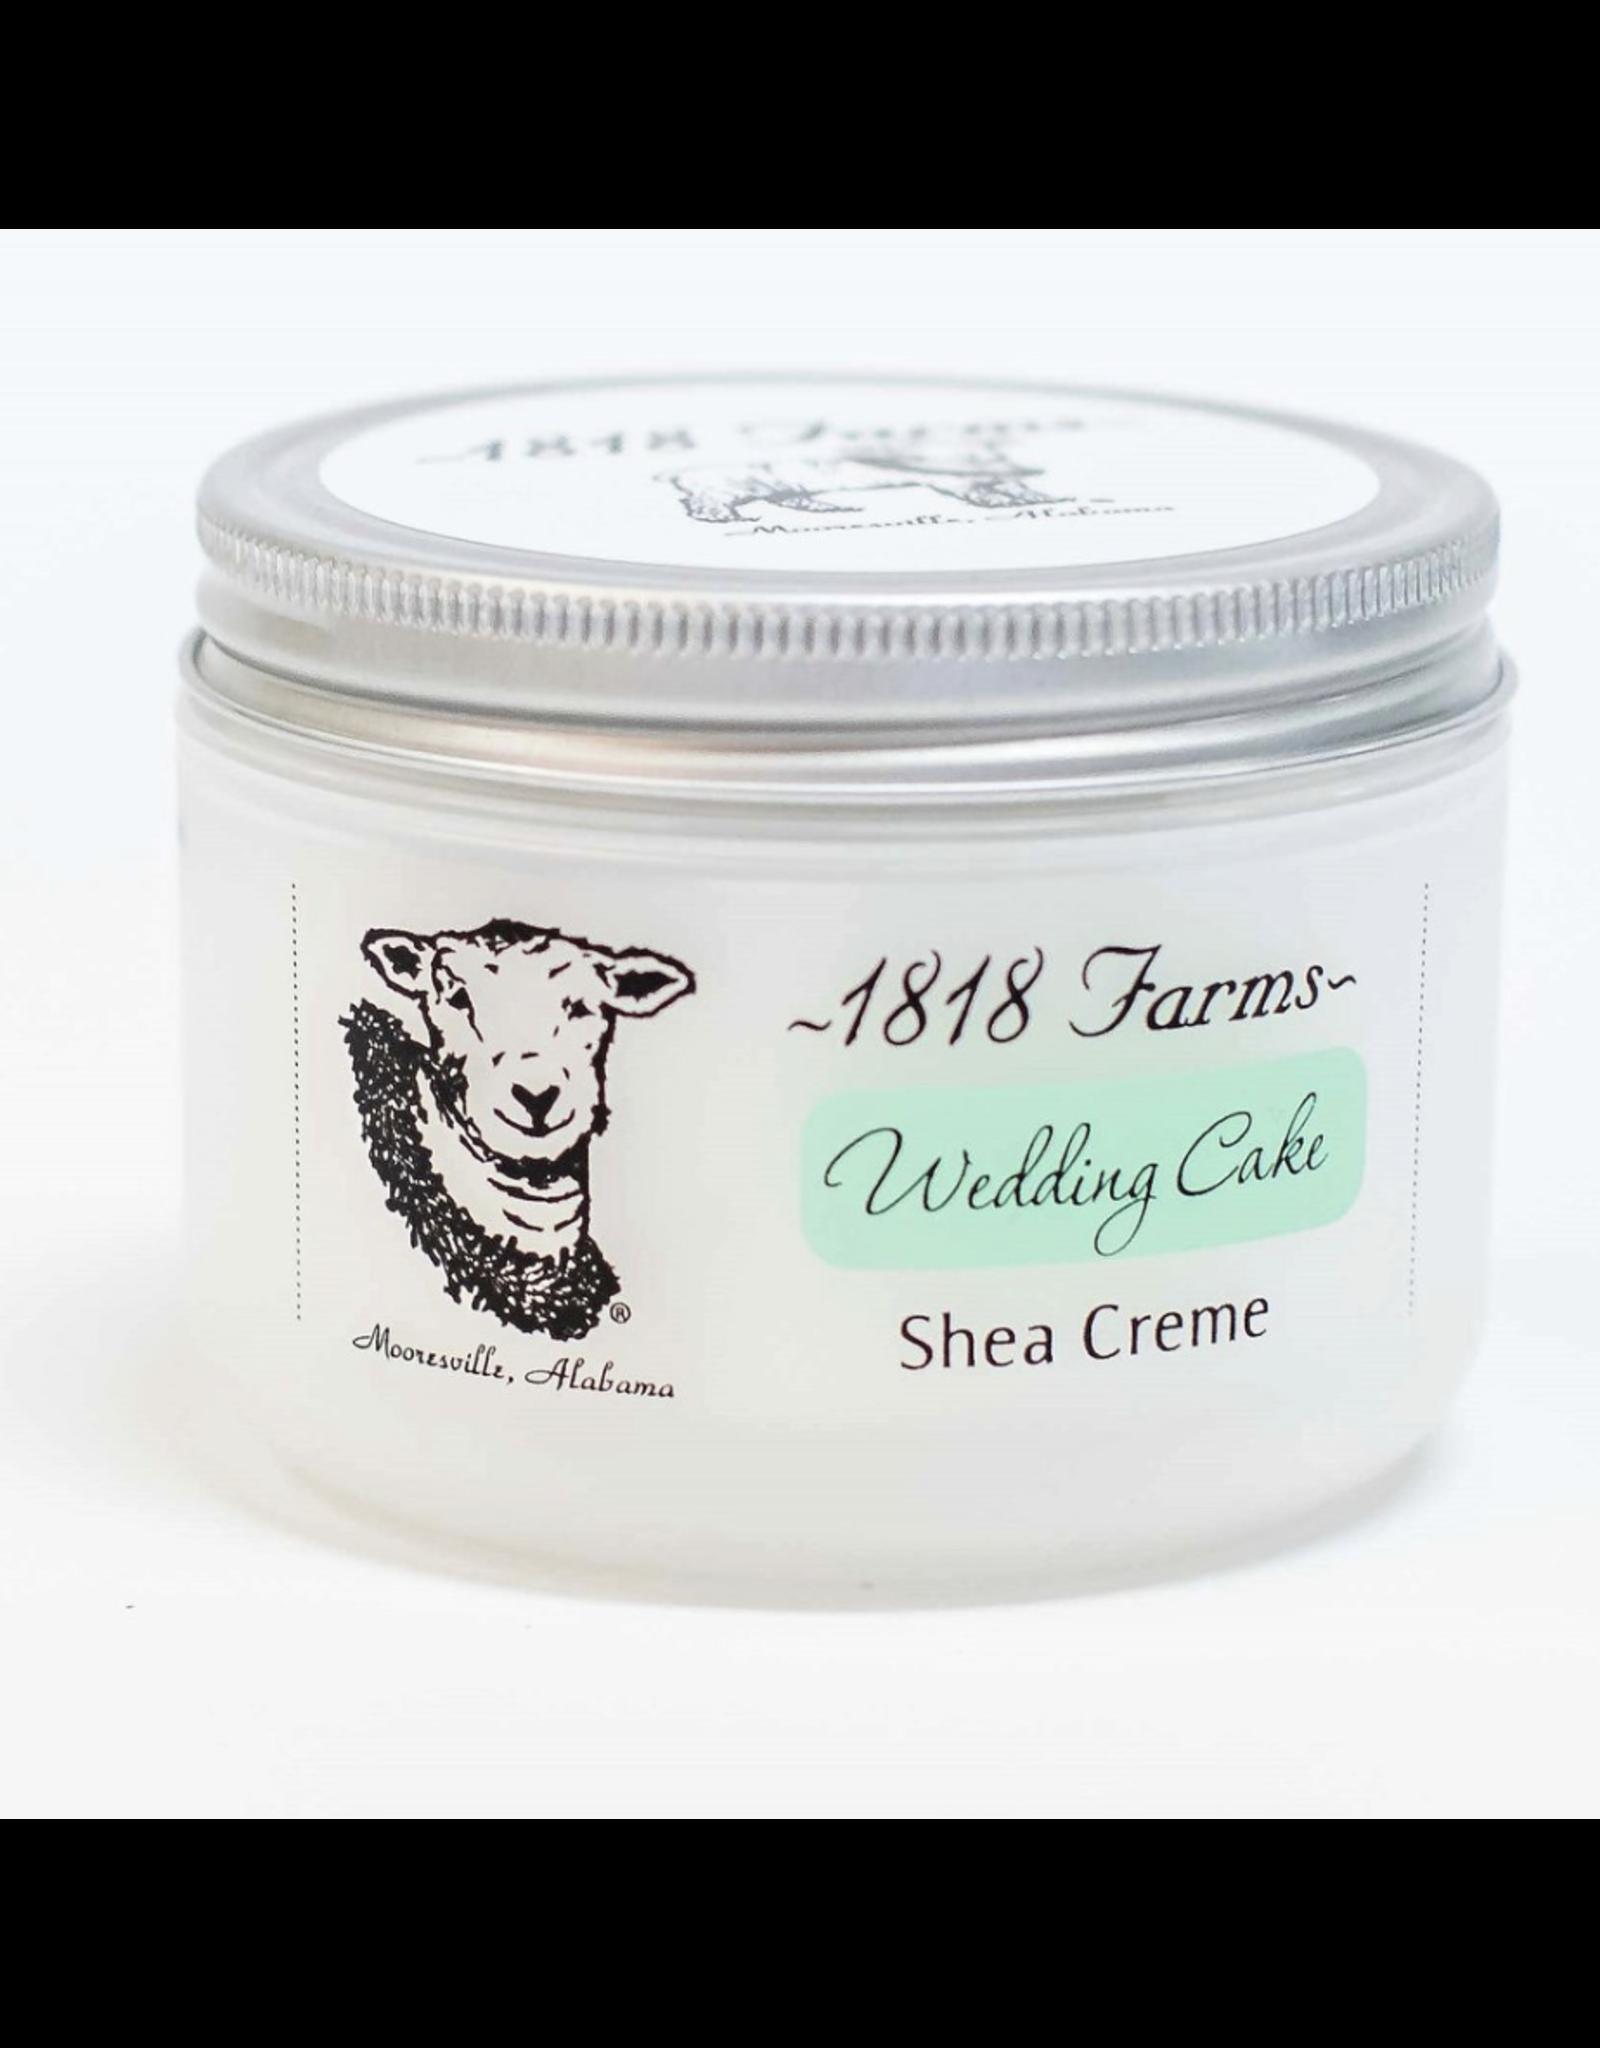 1818 Farms Shea Creme Wedding Cake 4 OZ